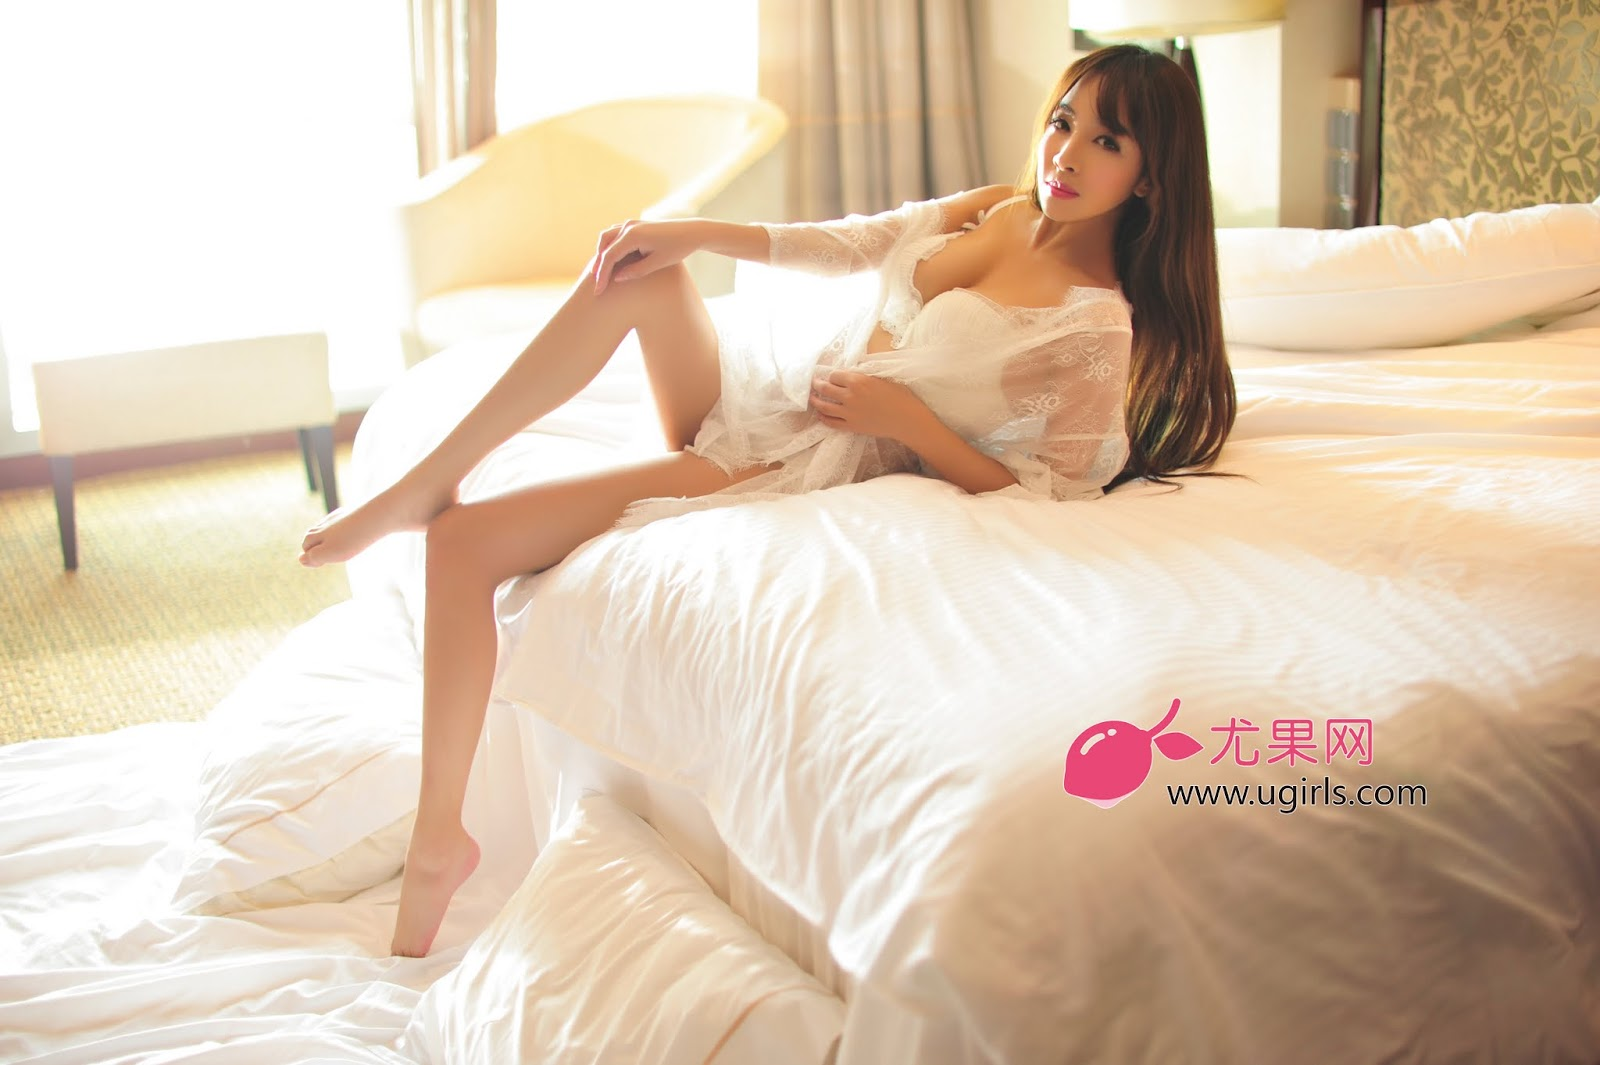 DLS 4568 - Hot Girl Model UGIRLS NO.13